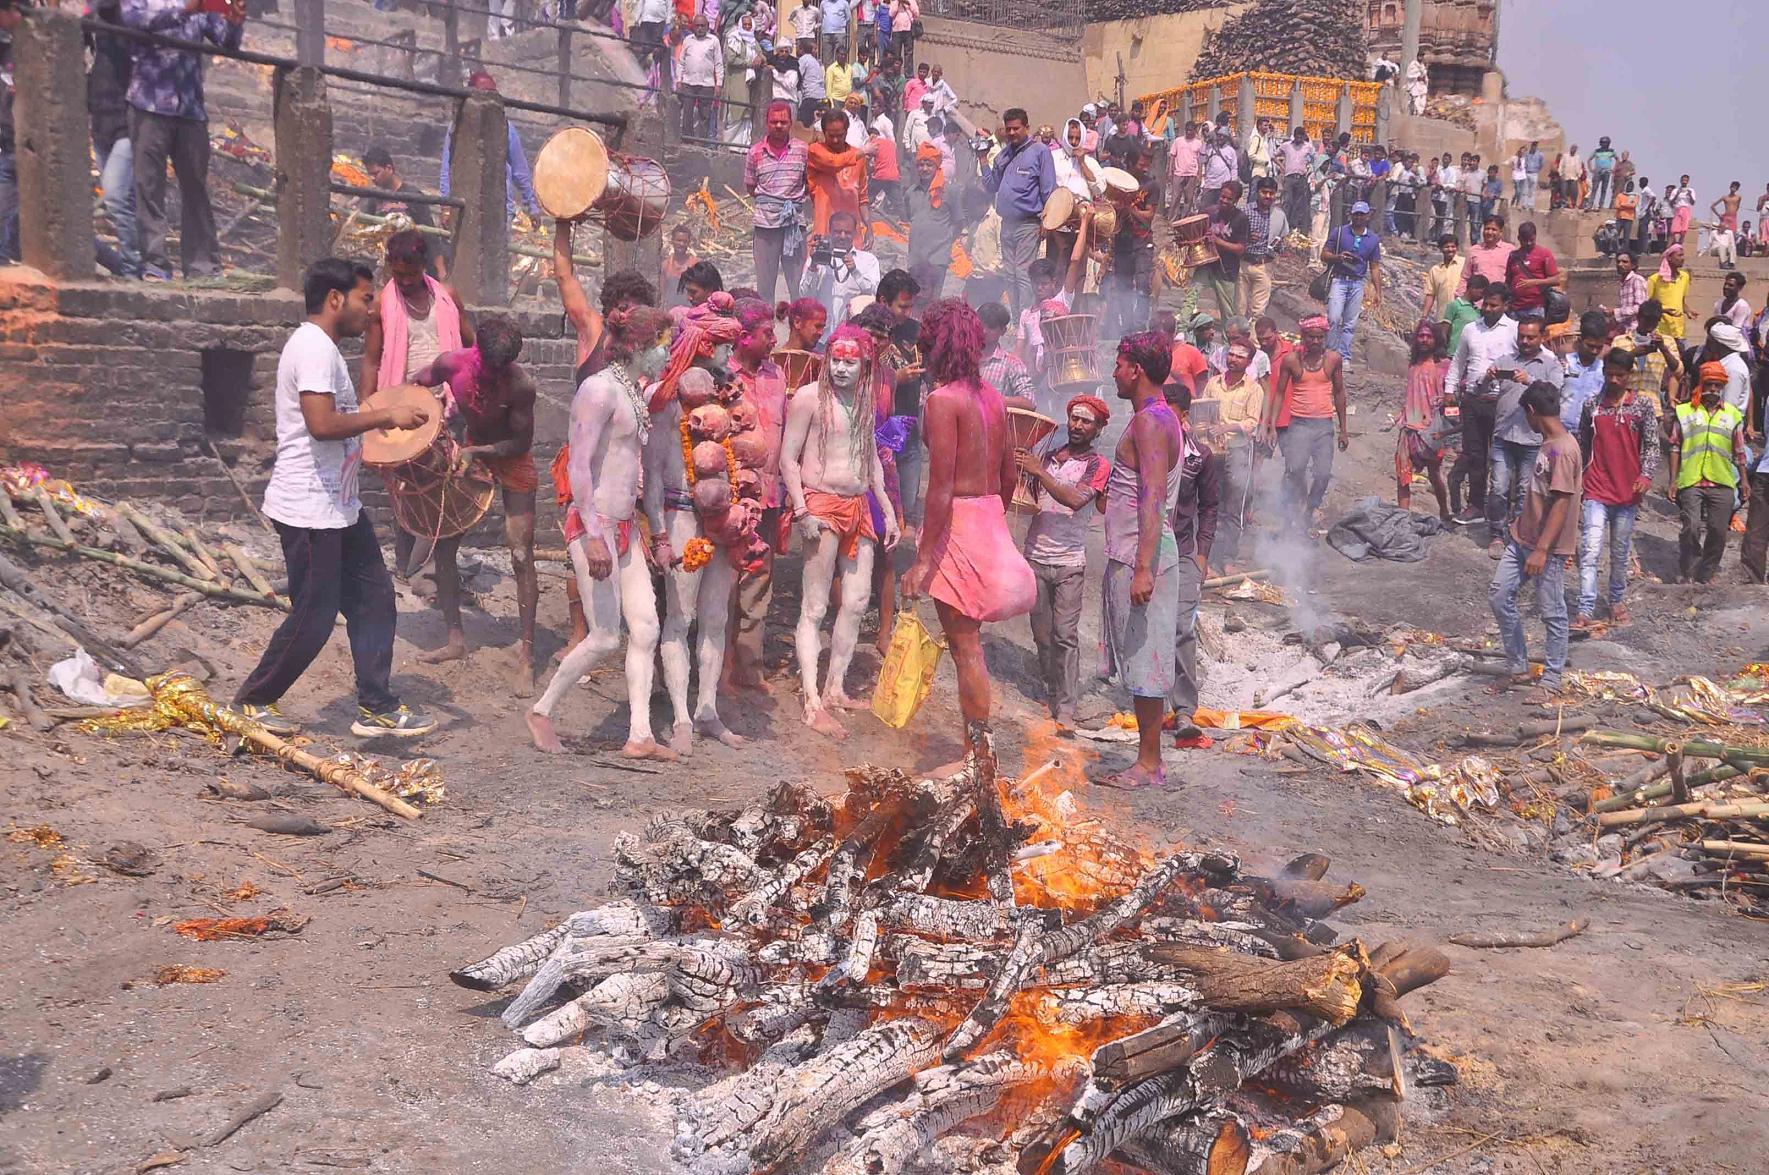 PunjabKesari, Manikarnika ghat, Holi festival in Manikarnik Ghat, using bhasma in holi festival, Holi 2020, holi 2020 in bihar, happy holi 2020, dhulandi 2020, holika dahan 2020, holi dhulandi 2020, dhulandi 2020 date, holi in vrindavan, dharm, hindu festival, holi festival, festival of colors